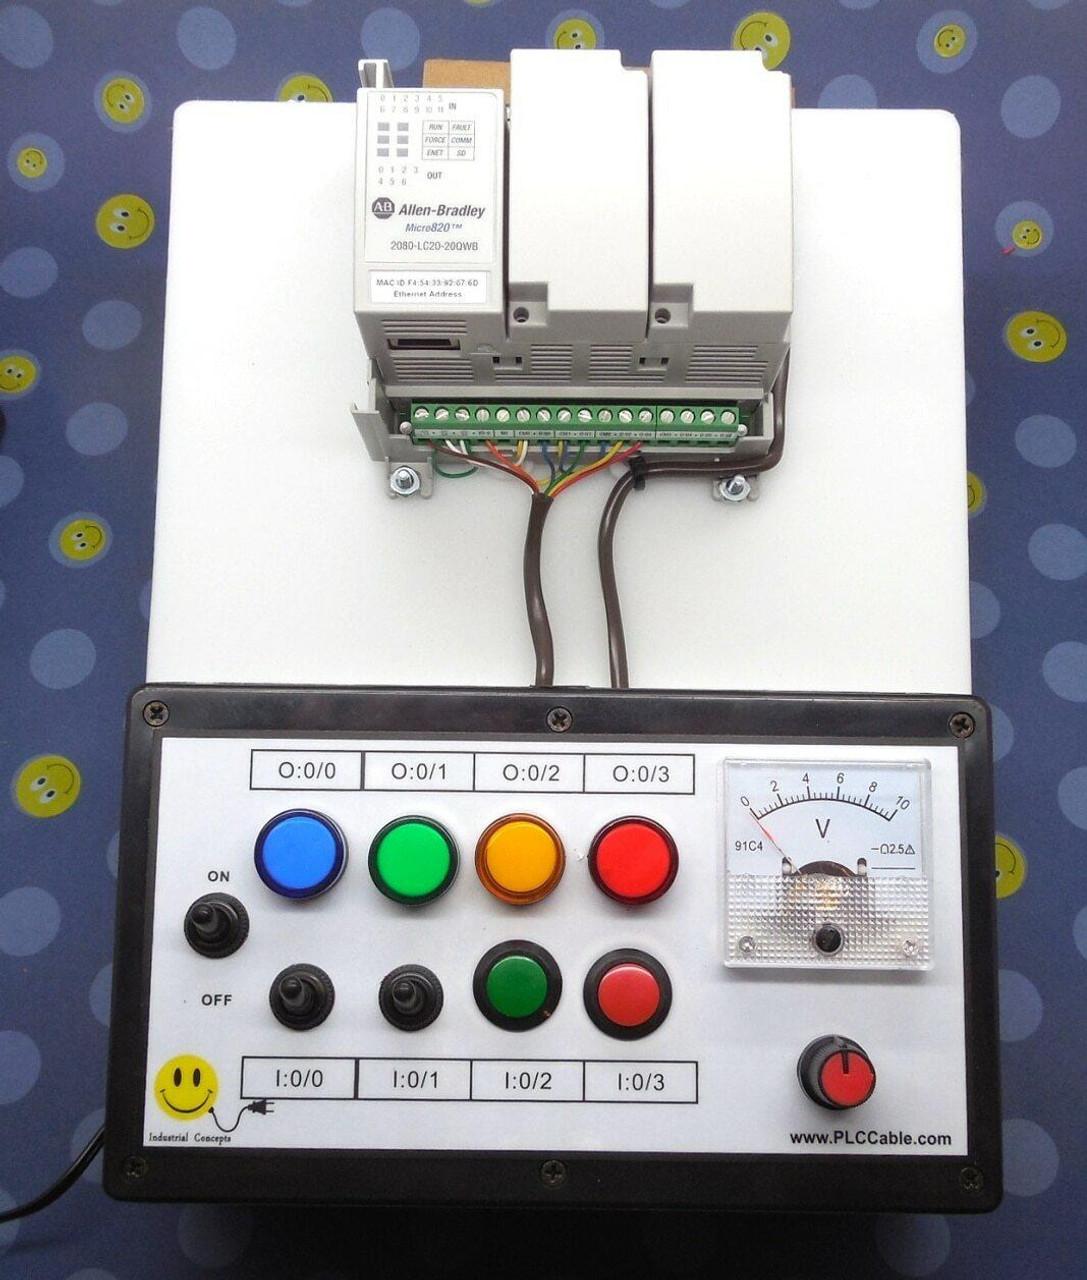 PLC Cables, Inc Allen-Bradley Micro820 Analog CCW PLC Trainer Micro800 Training Kit